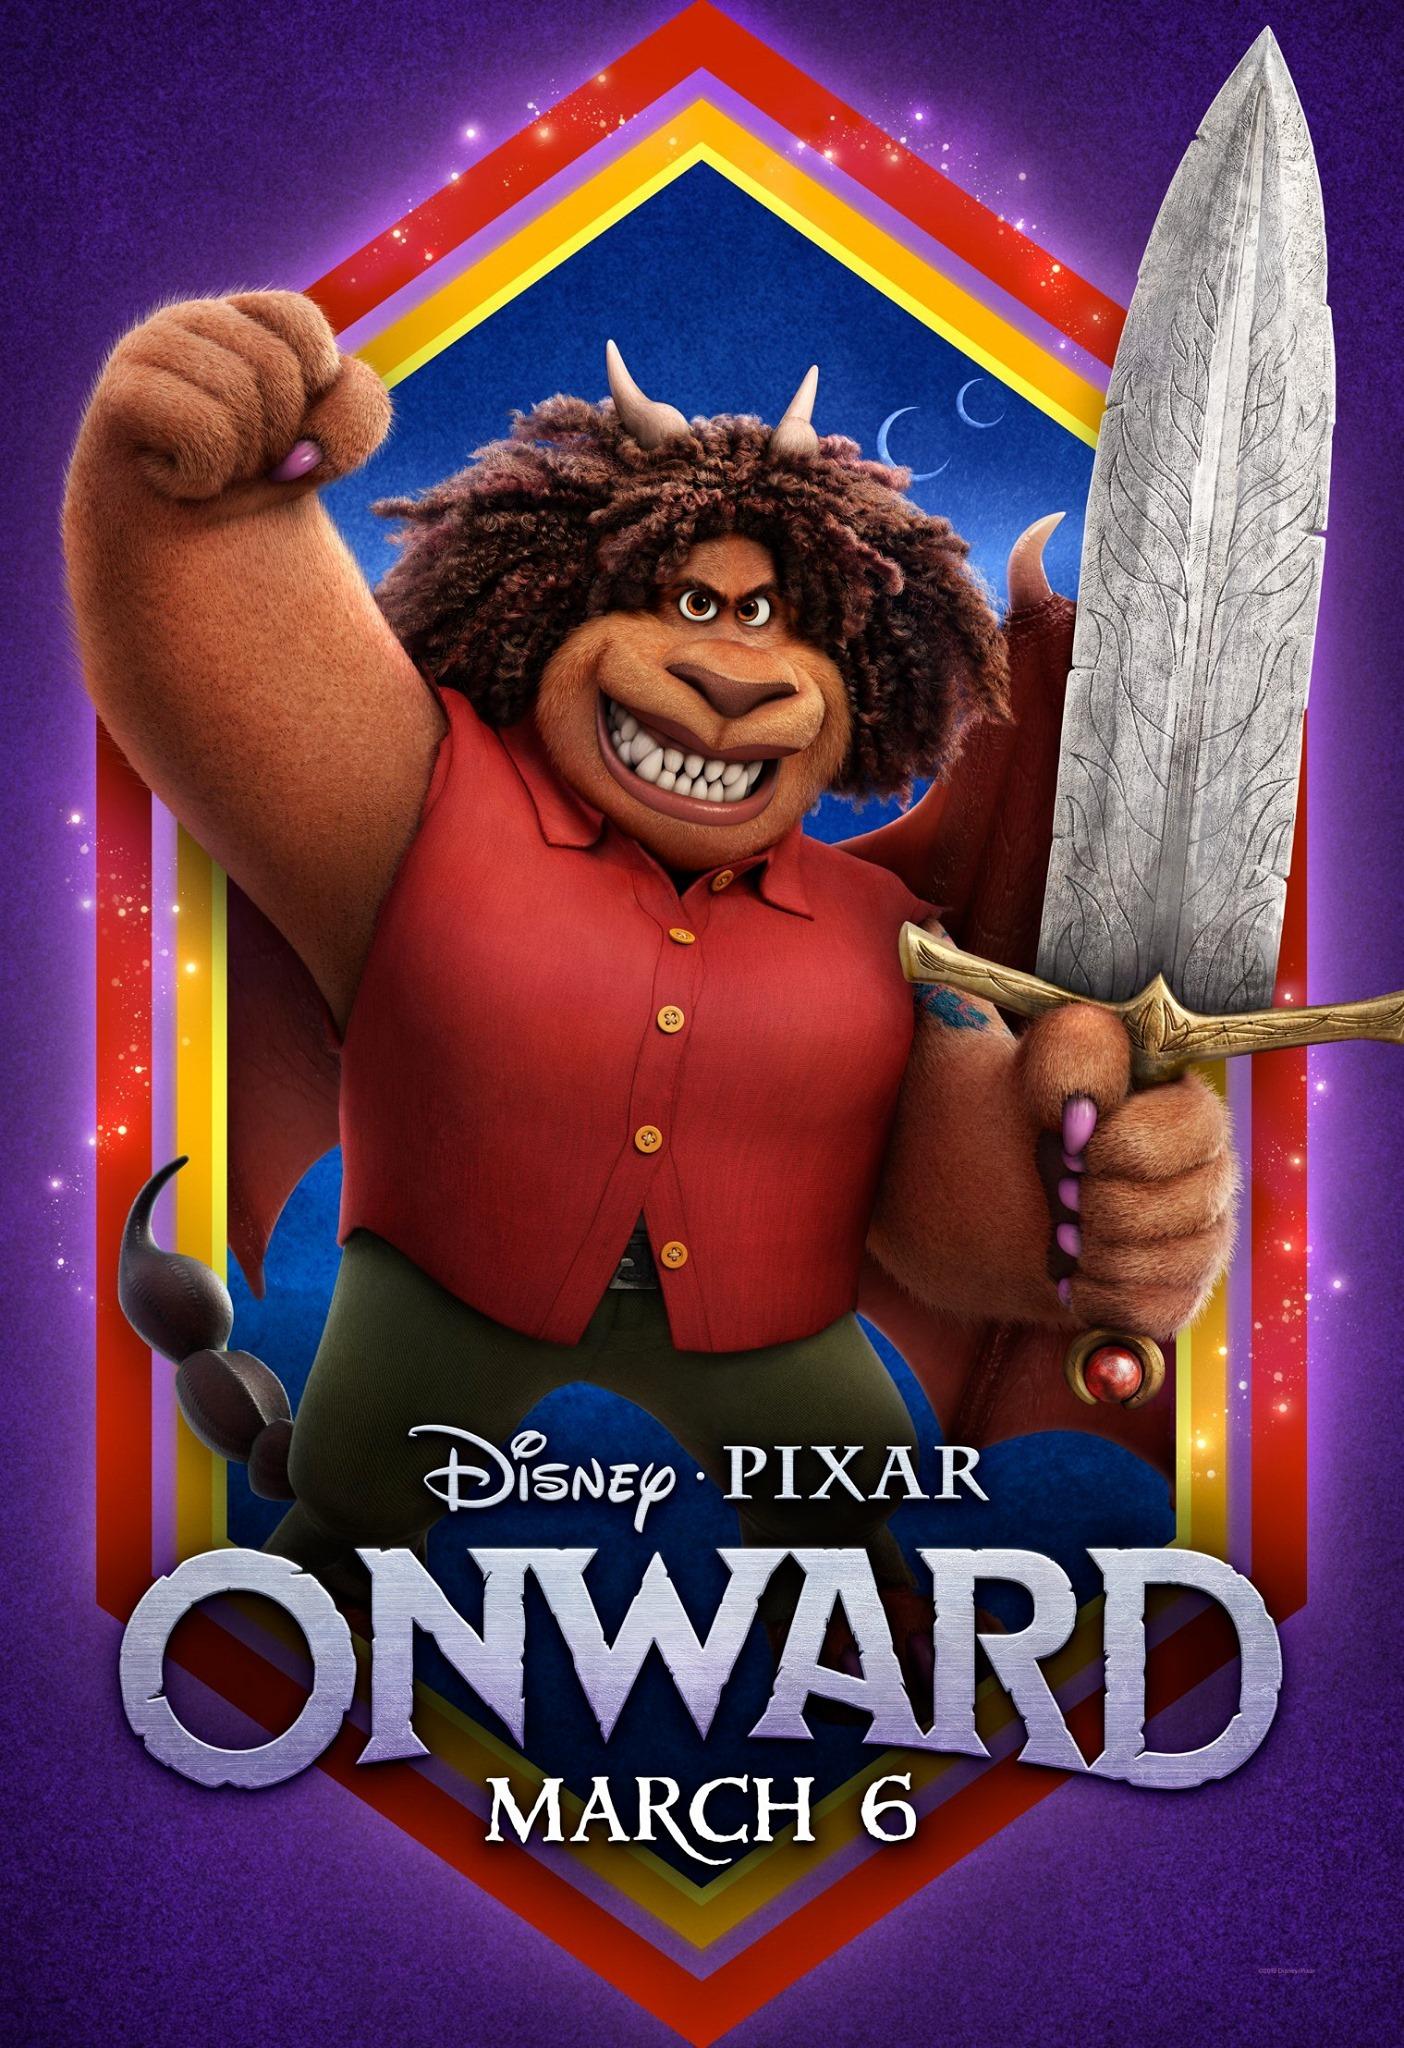 szmk_onward_elore_pixar_disney_animaacos_film_7.jpg